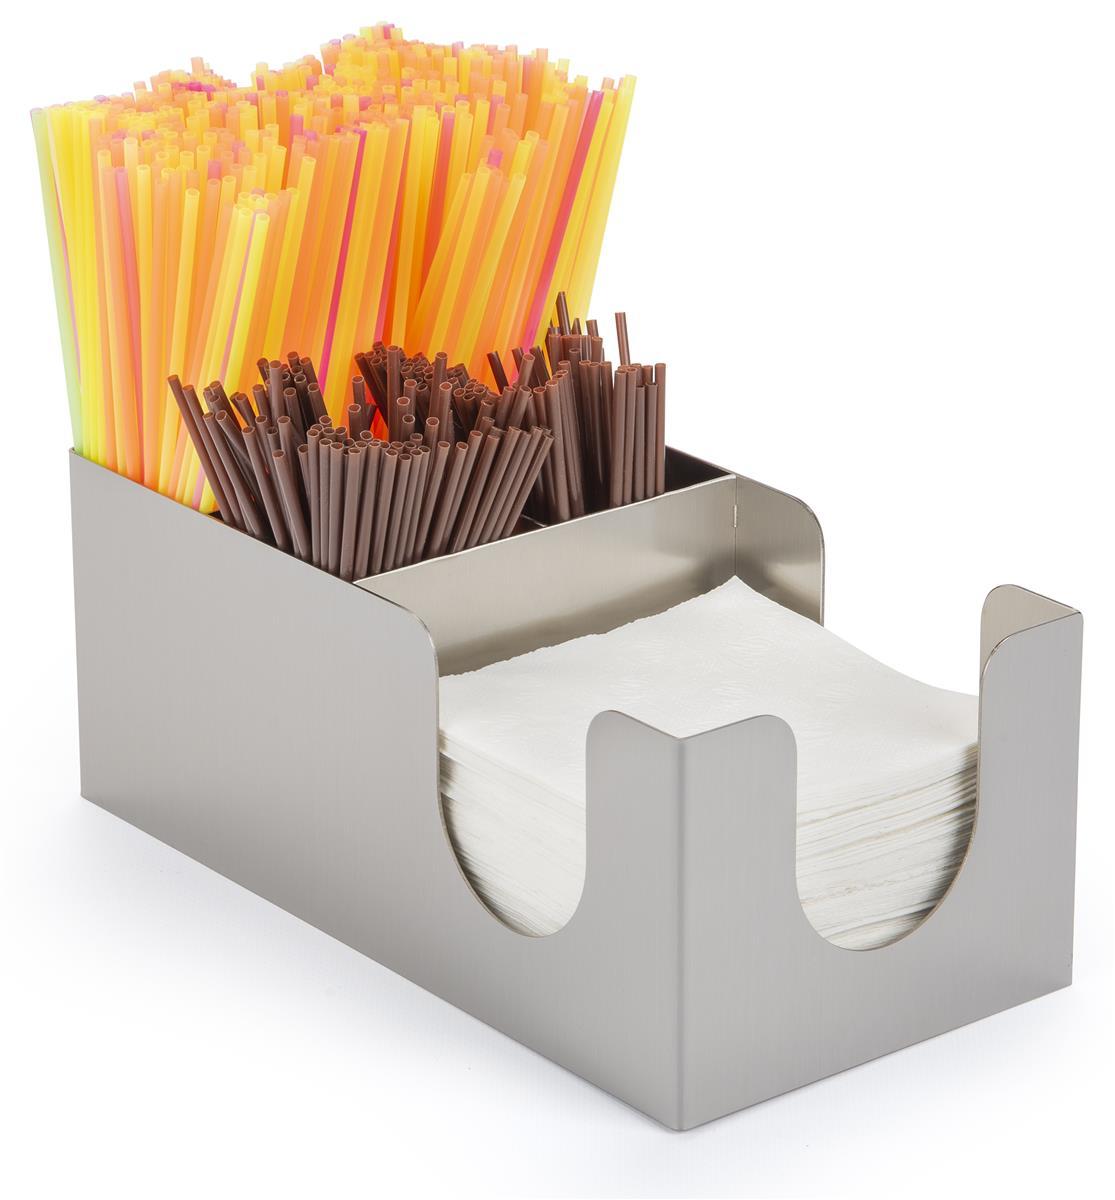 SS Ecom Stainless Steel Straw Holder,Counter-top Straw Dispenser,Toothpicks Organizer,Spoons Forks Chopsticks Storage Stainless Steel Hotel Restaurant Home Desk Decor